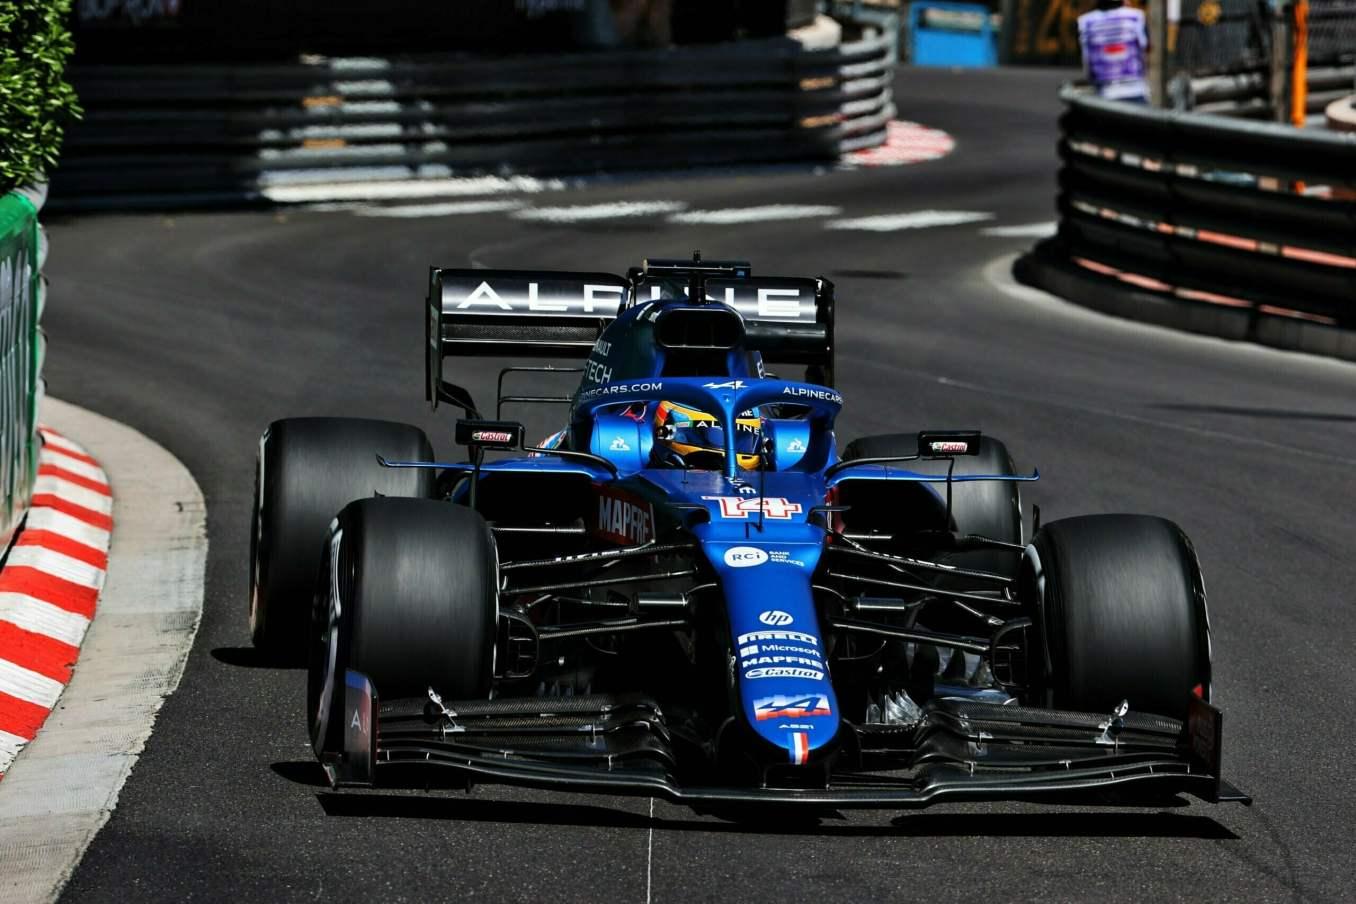 Alpine F1 Qualifications A521 Monaco Alonso Ocon 2021 15 scaled | Alpine F1 n'atteint pas la Q3 à Monaco